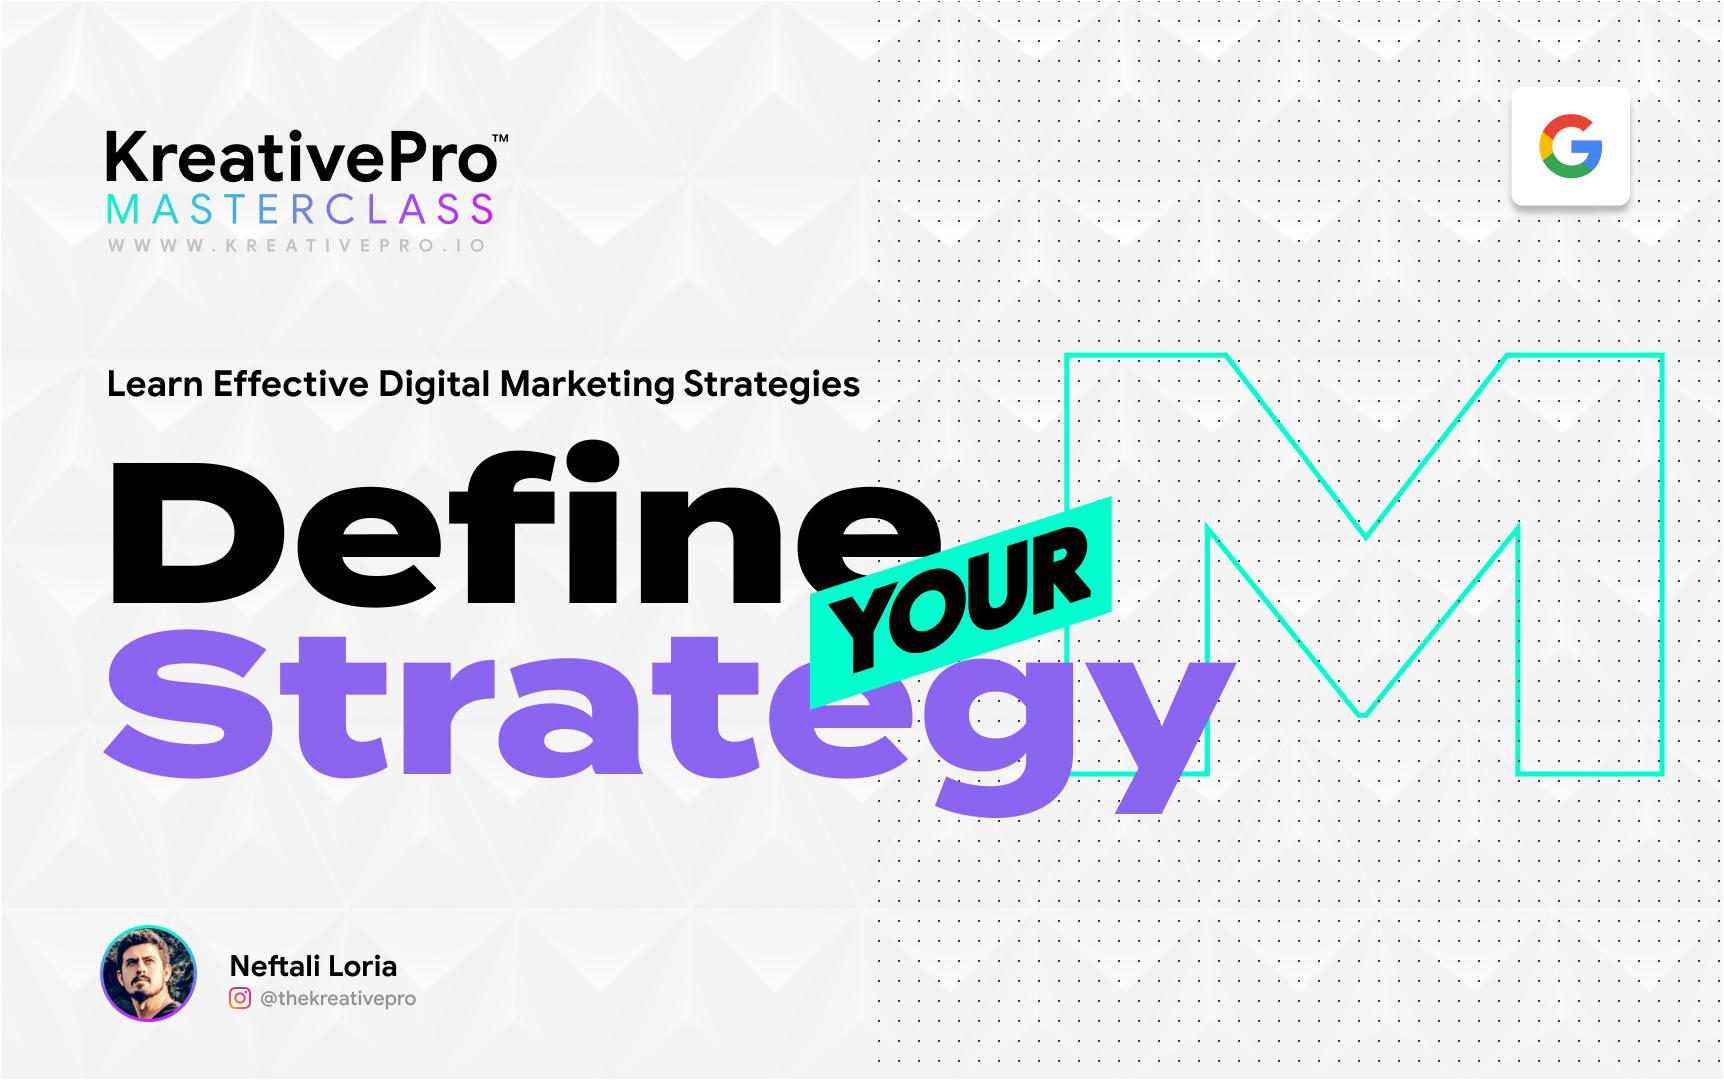 Marketing 3.1 - Define Your Strategy